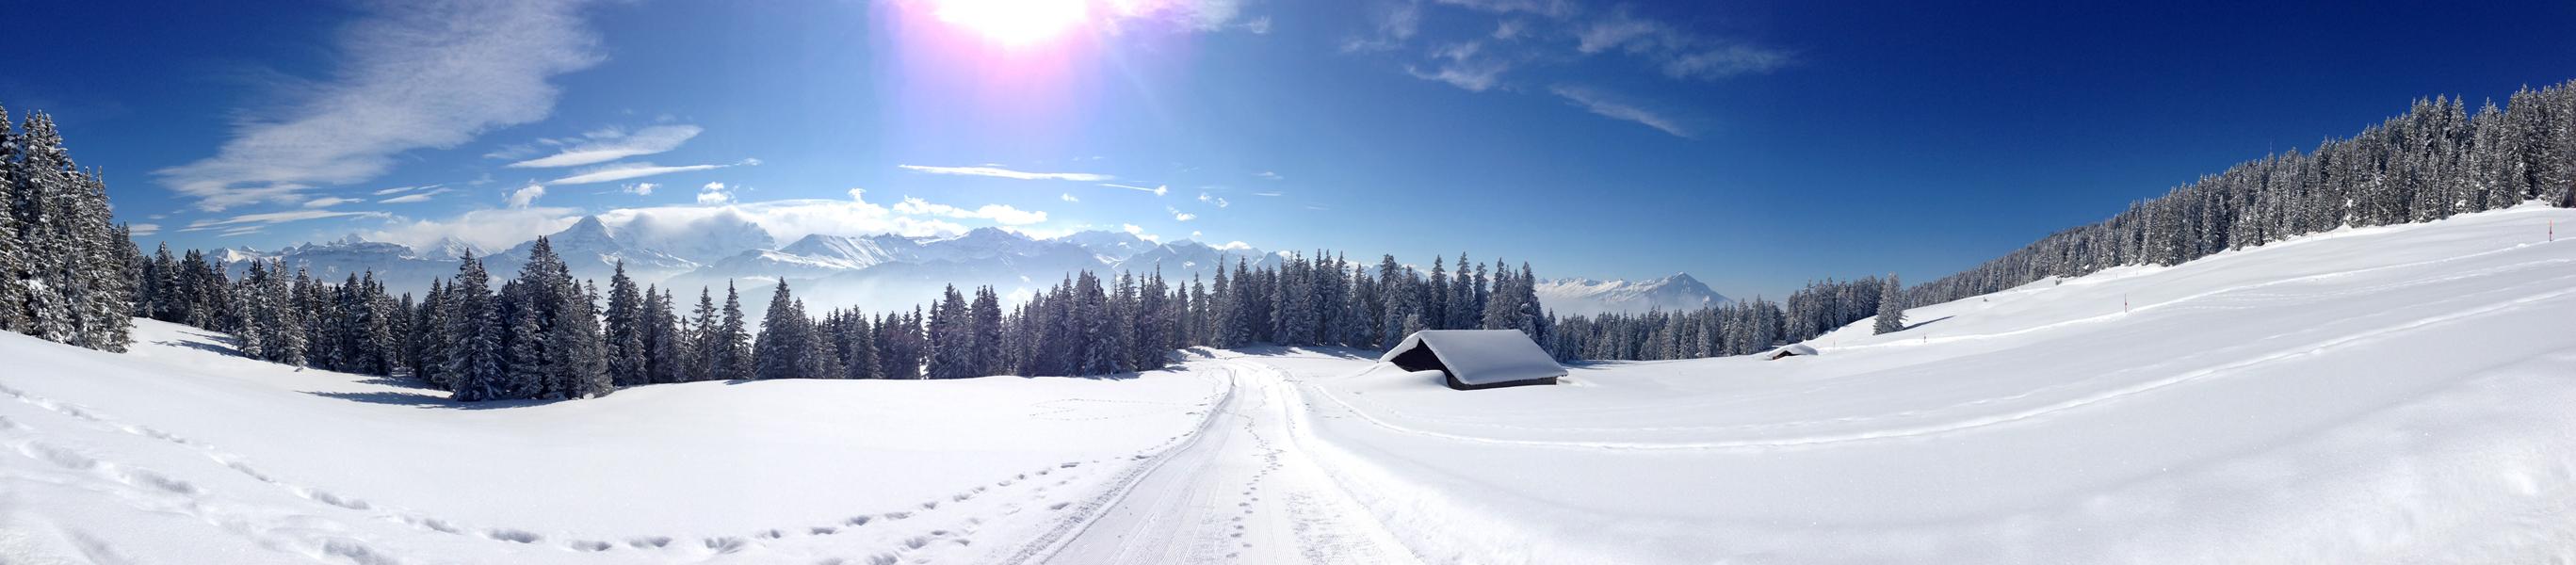 Grandioses Panorama (Fullsize empfohlen)